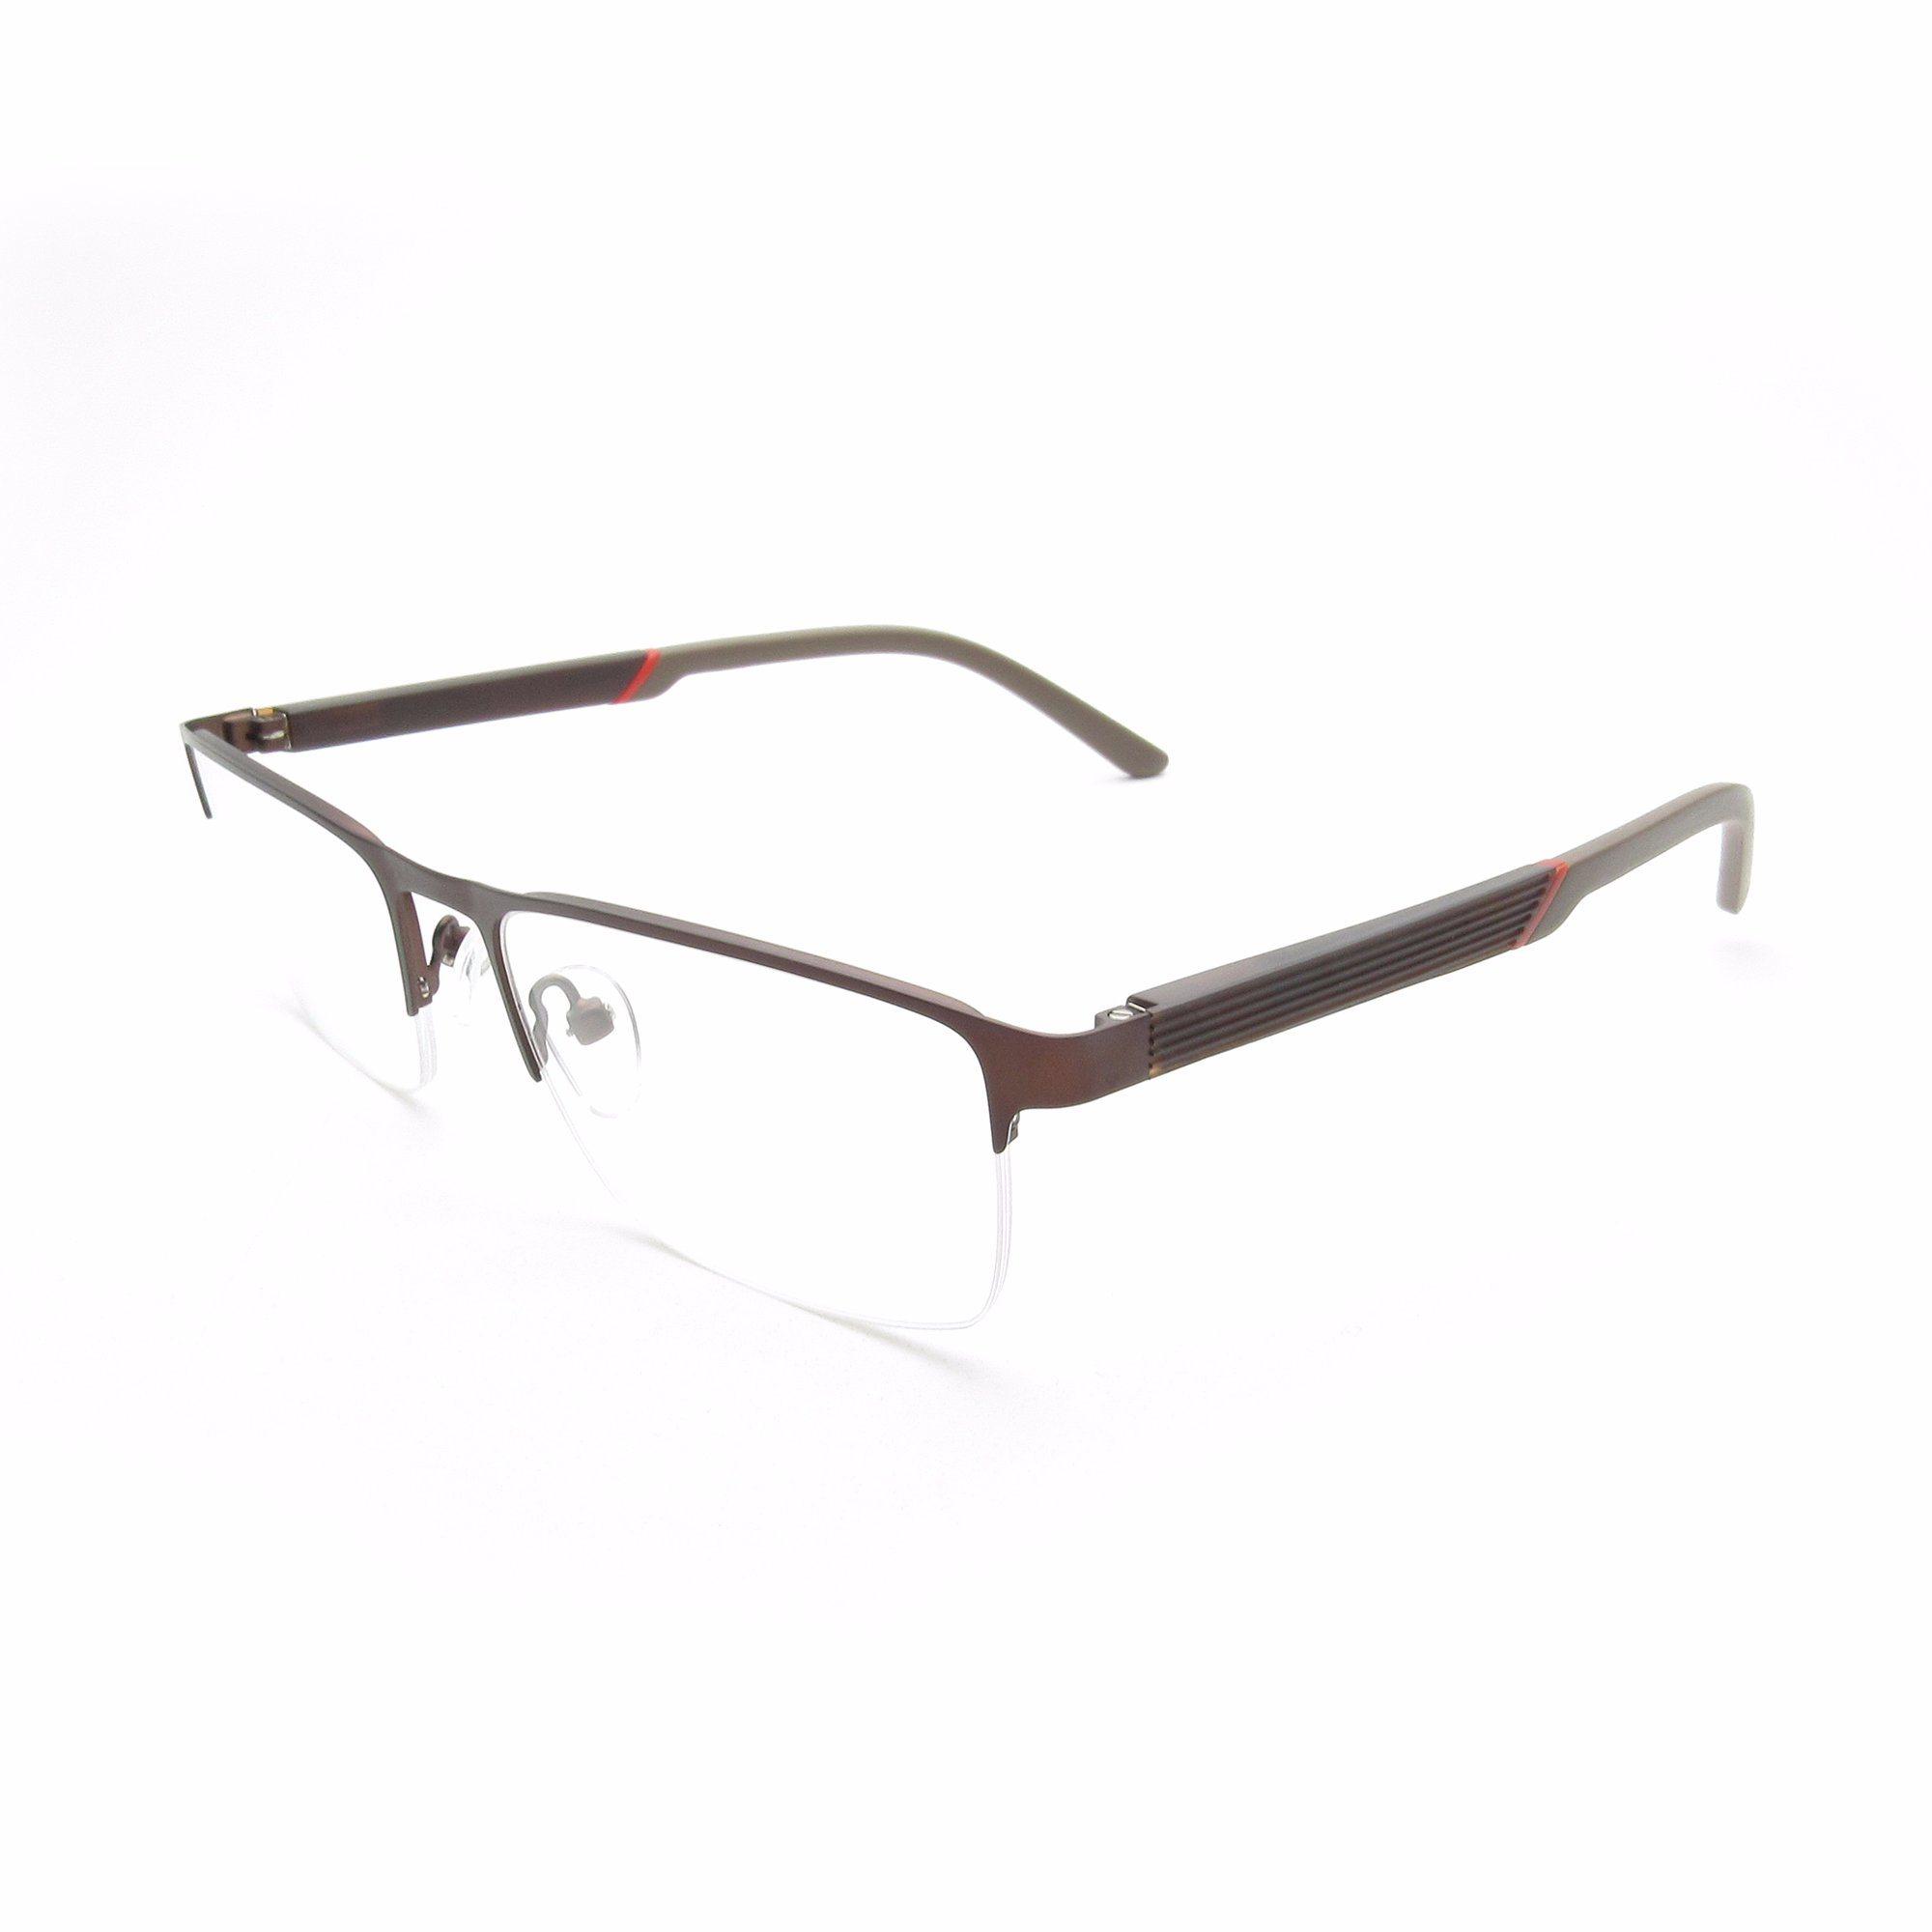 Cheap Price Hq0115 High-End Solid Hinge Fancy Unisex Optical Eyeglasses Frame